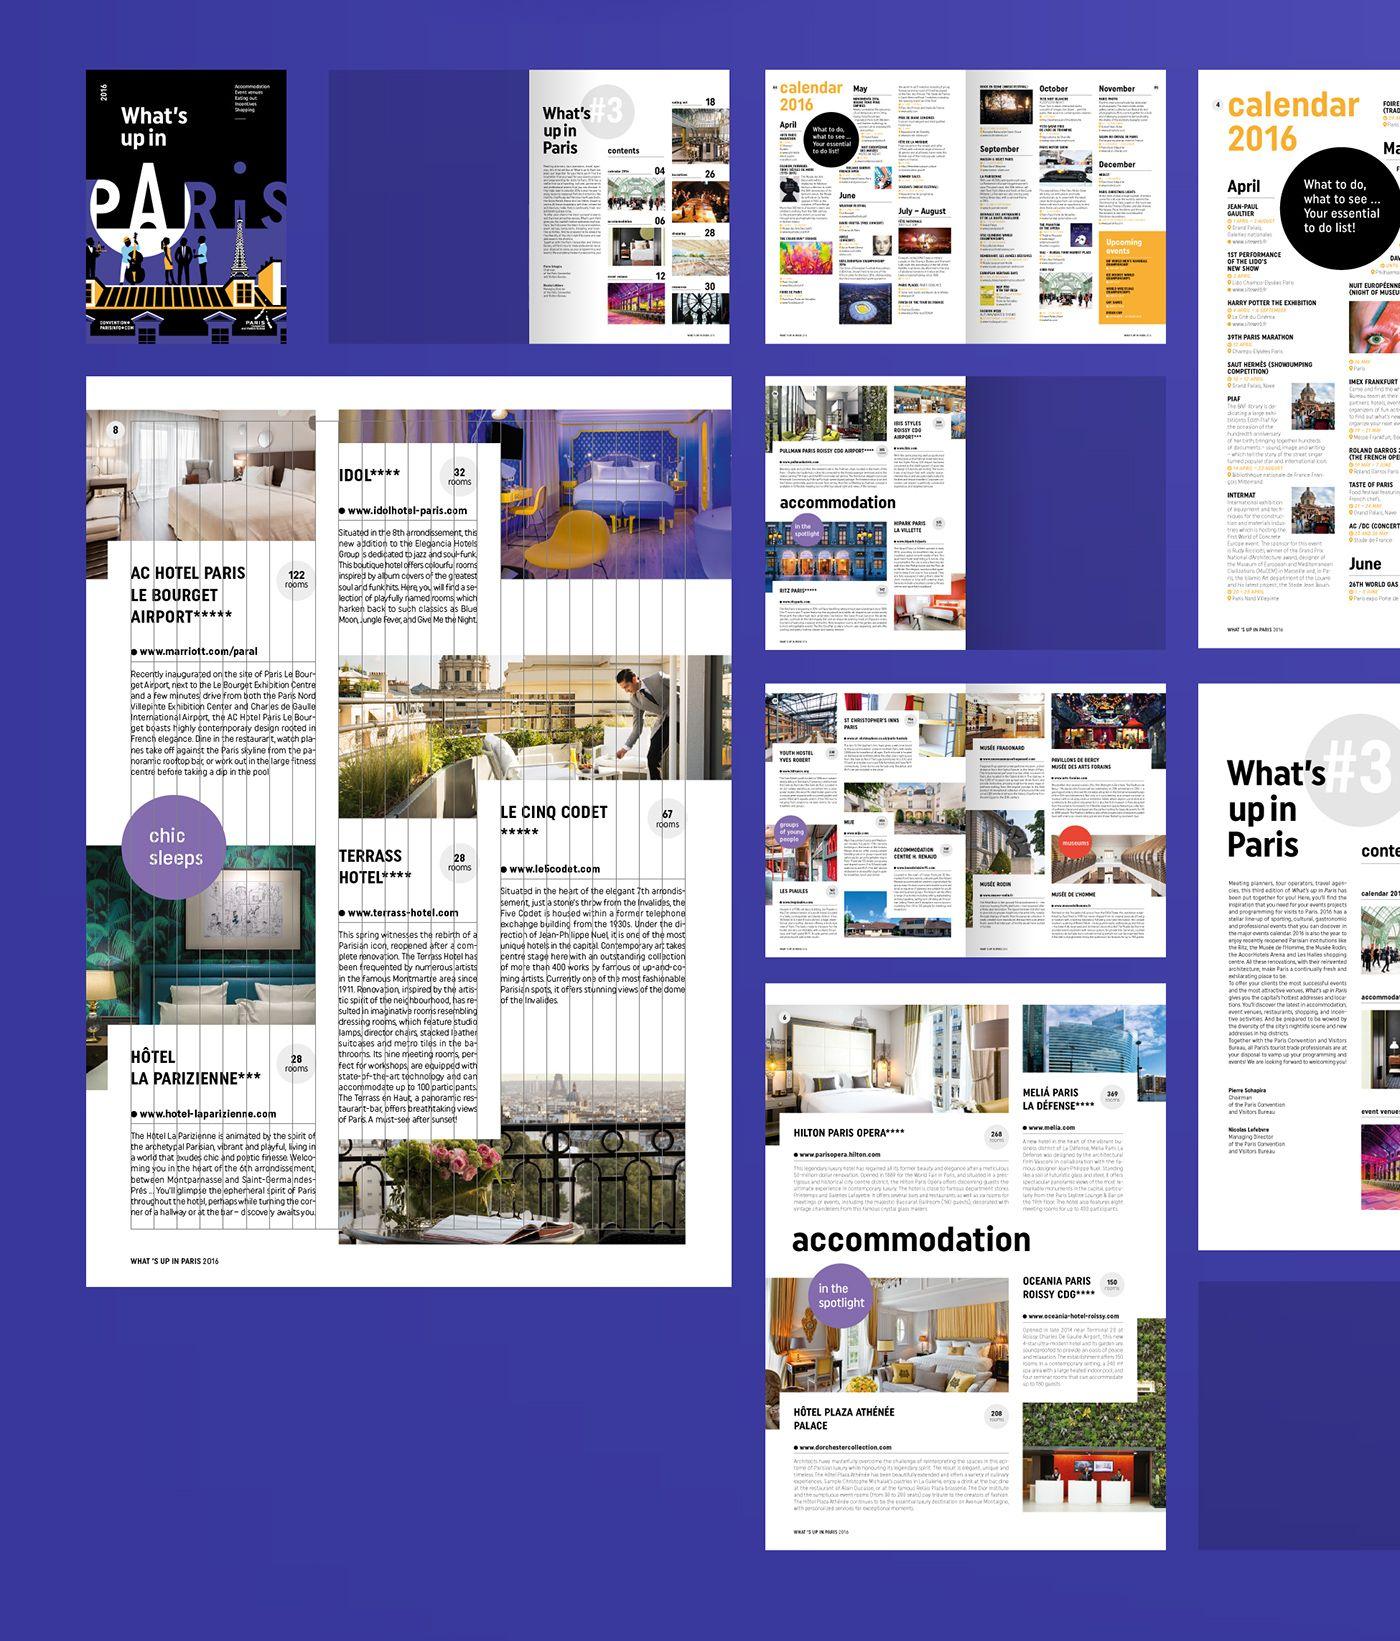 Paris Convention And Visitors Bureau Brand Design On Behance Tourism Design Branding Design Booklet Design